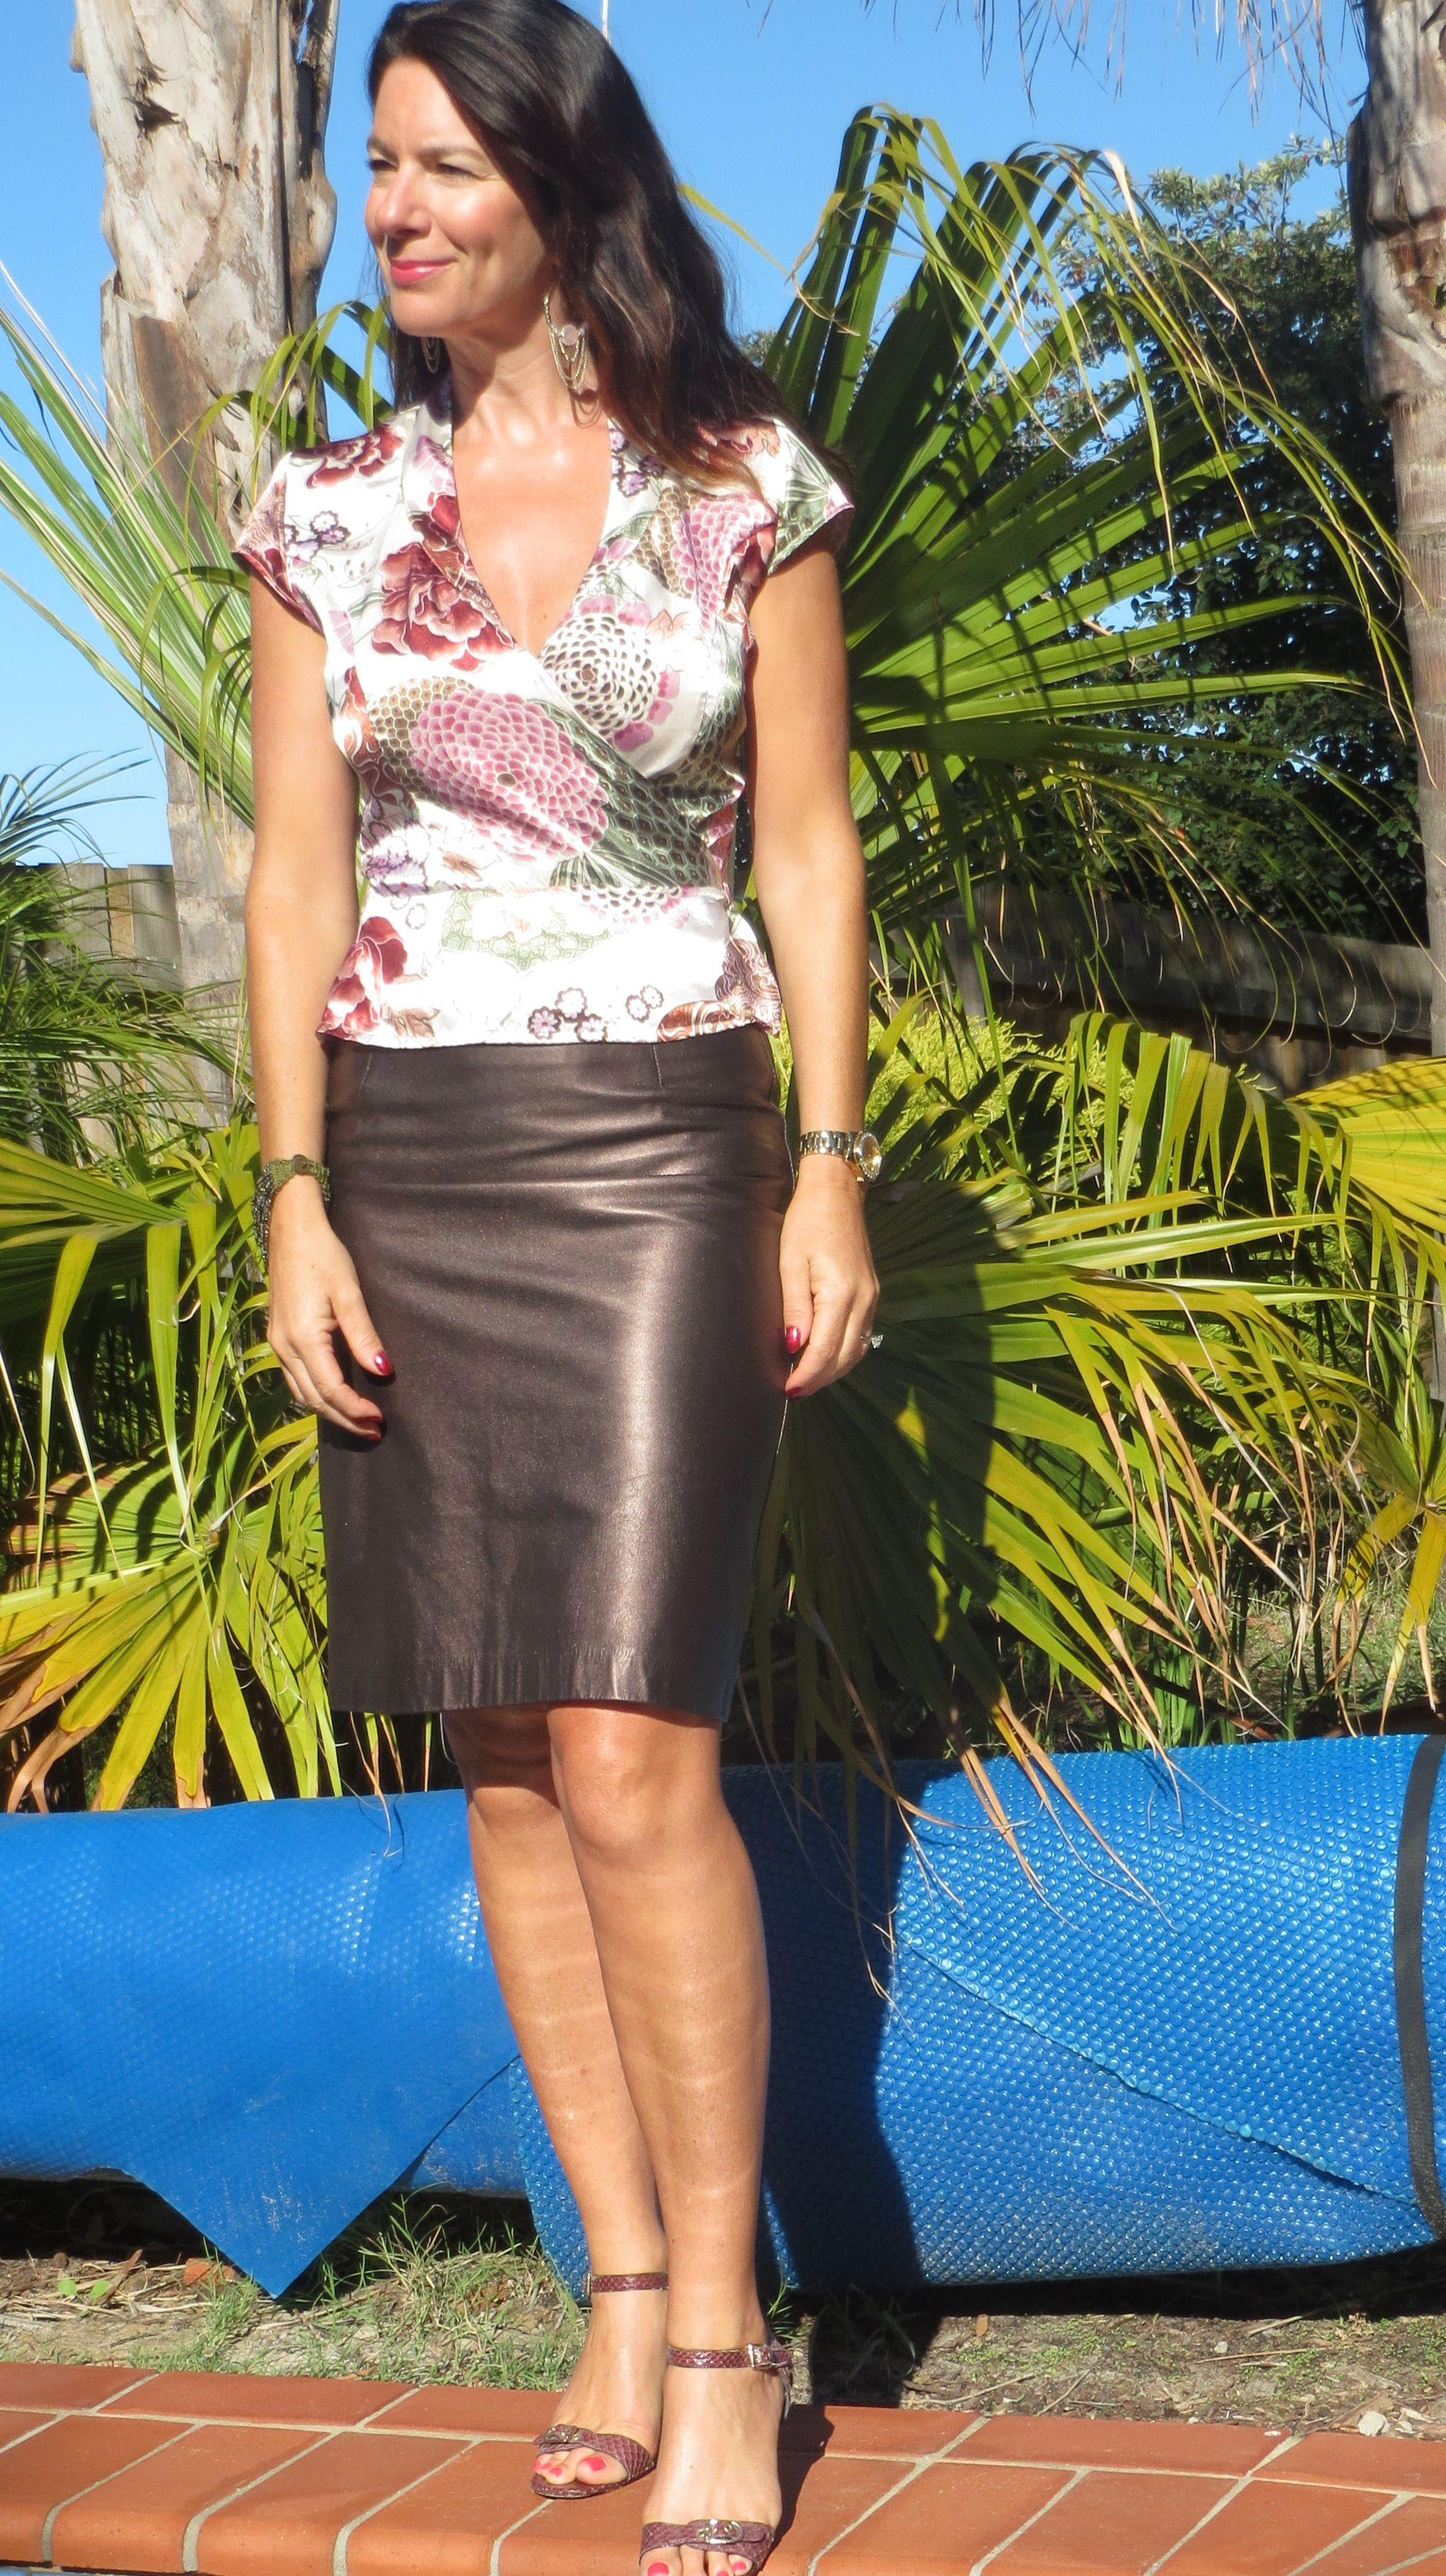 leather metallic skirt 1   mature fashion   pinterest   metallic